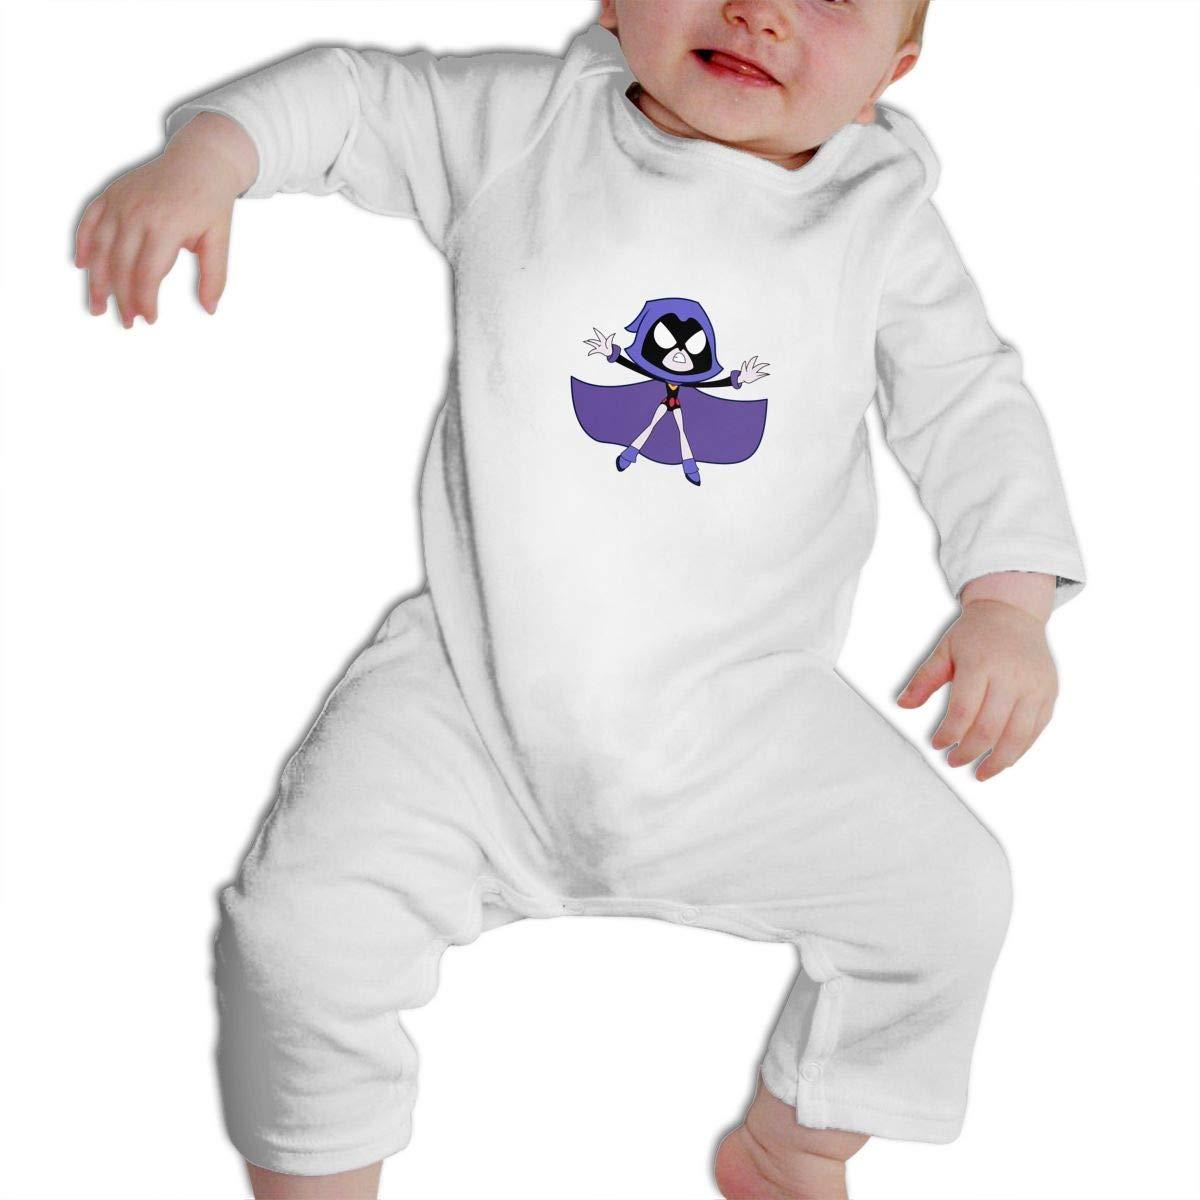 POOPEDD Teen Titans Go Unisex Baby Long Sleeve Onesies Baby Bodysuits